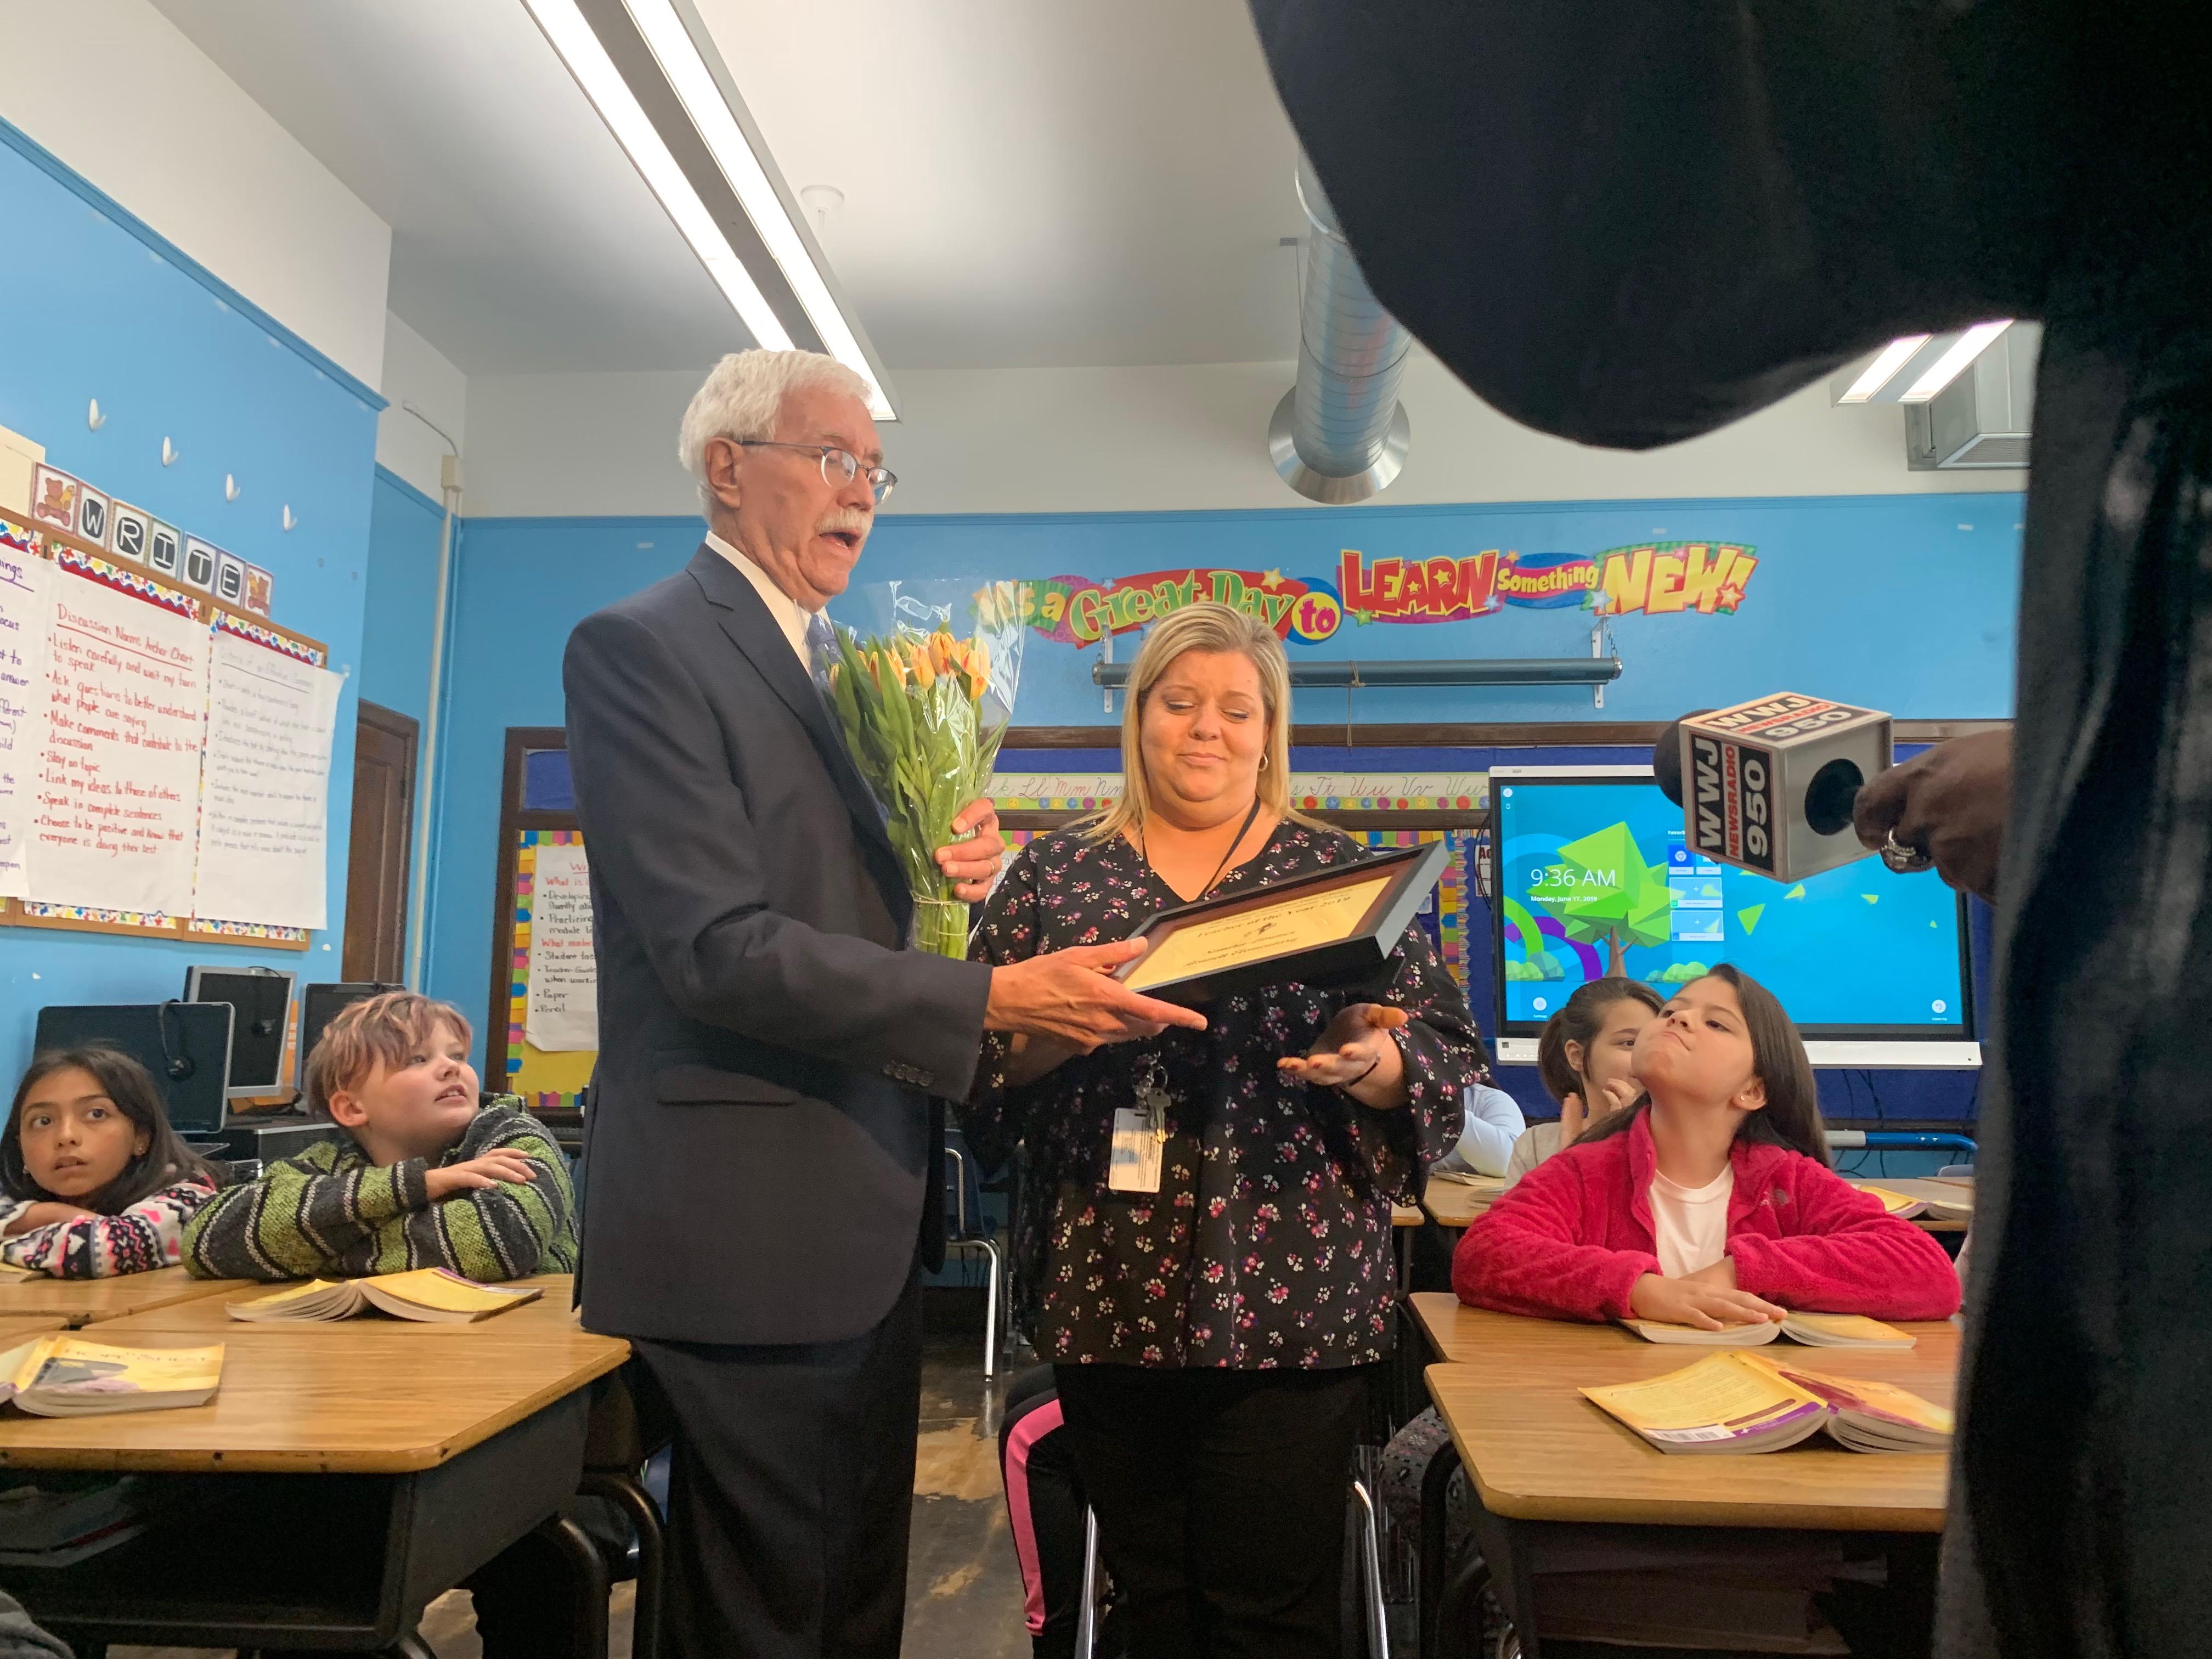 Detroit Goodfellows President Marshall Hunt presents Sandra Limmer with the Teacher of the Year award.